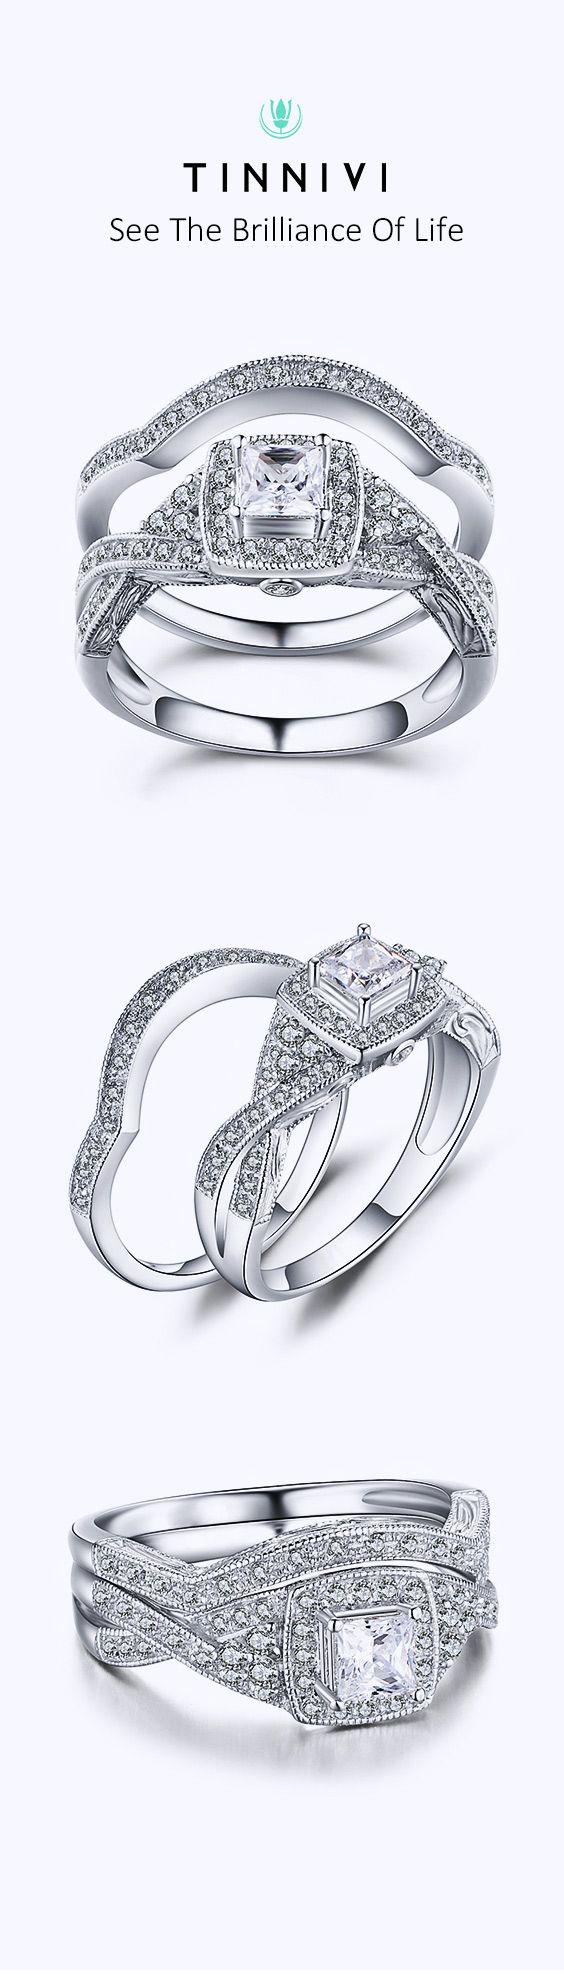 e6738c4c1d7 Tinnivi Princess Cut Gemstone 925 Sterling Silver Wedding Sets in ...